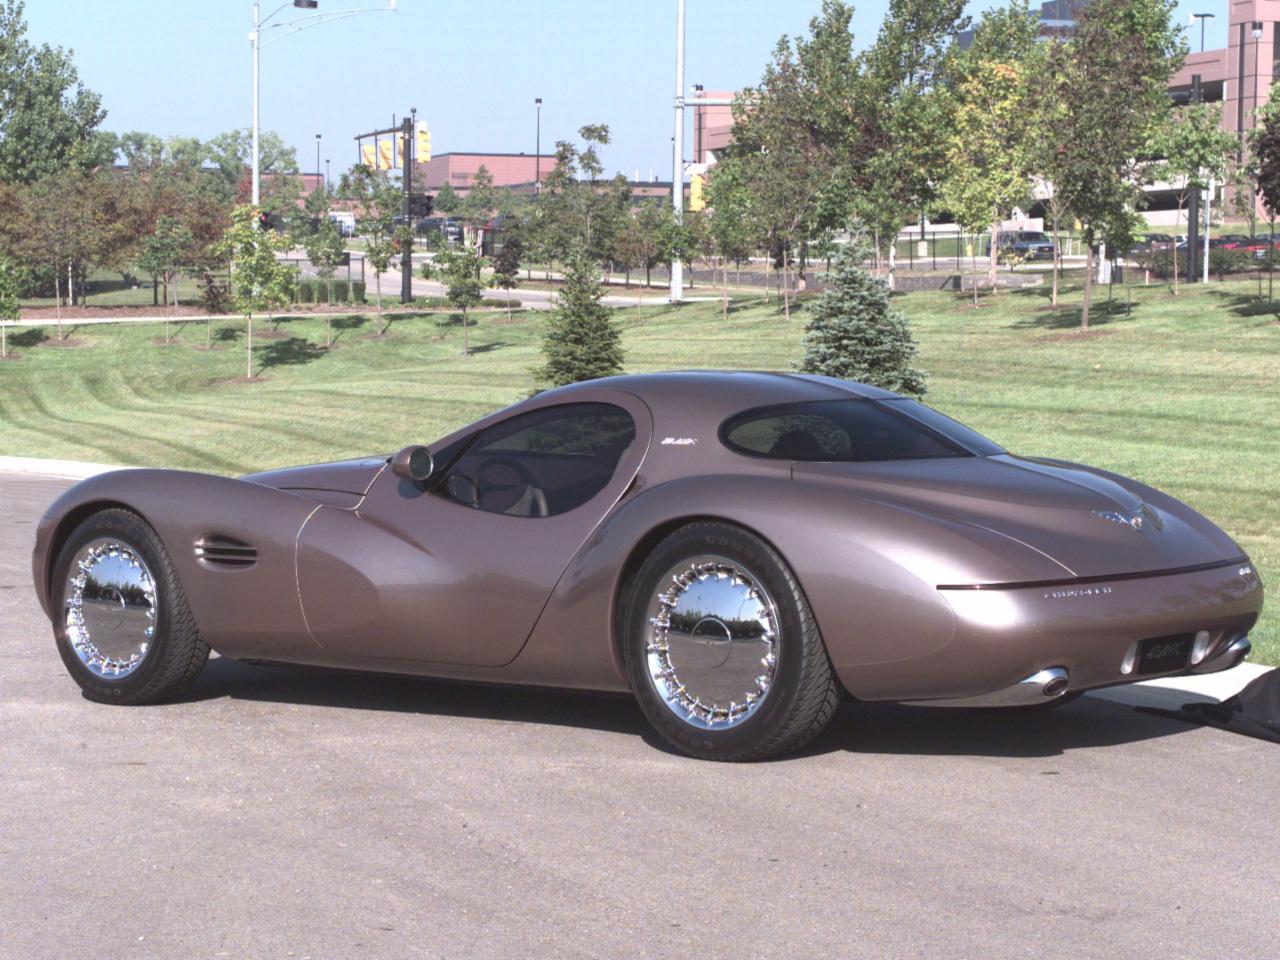 Chrysler Atlantic Concept Amcarguide Com American